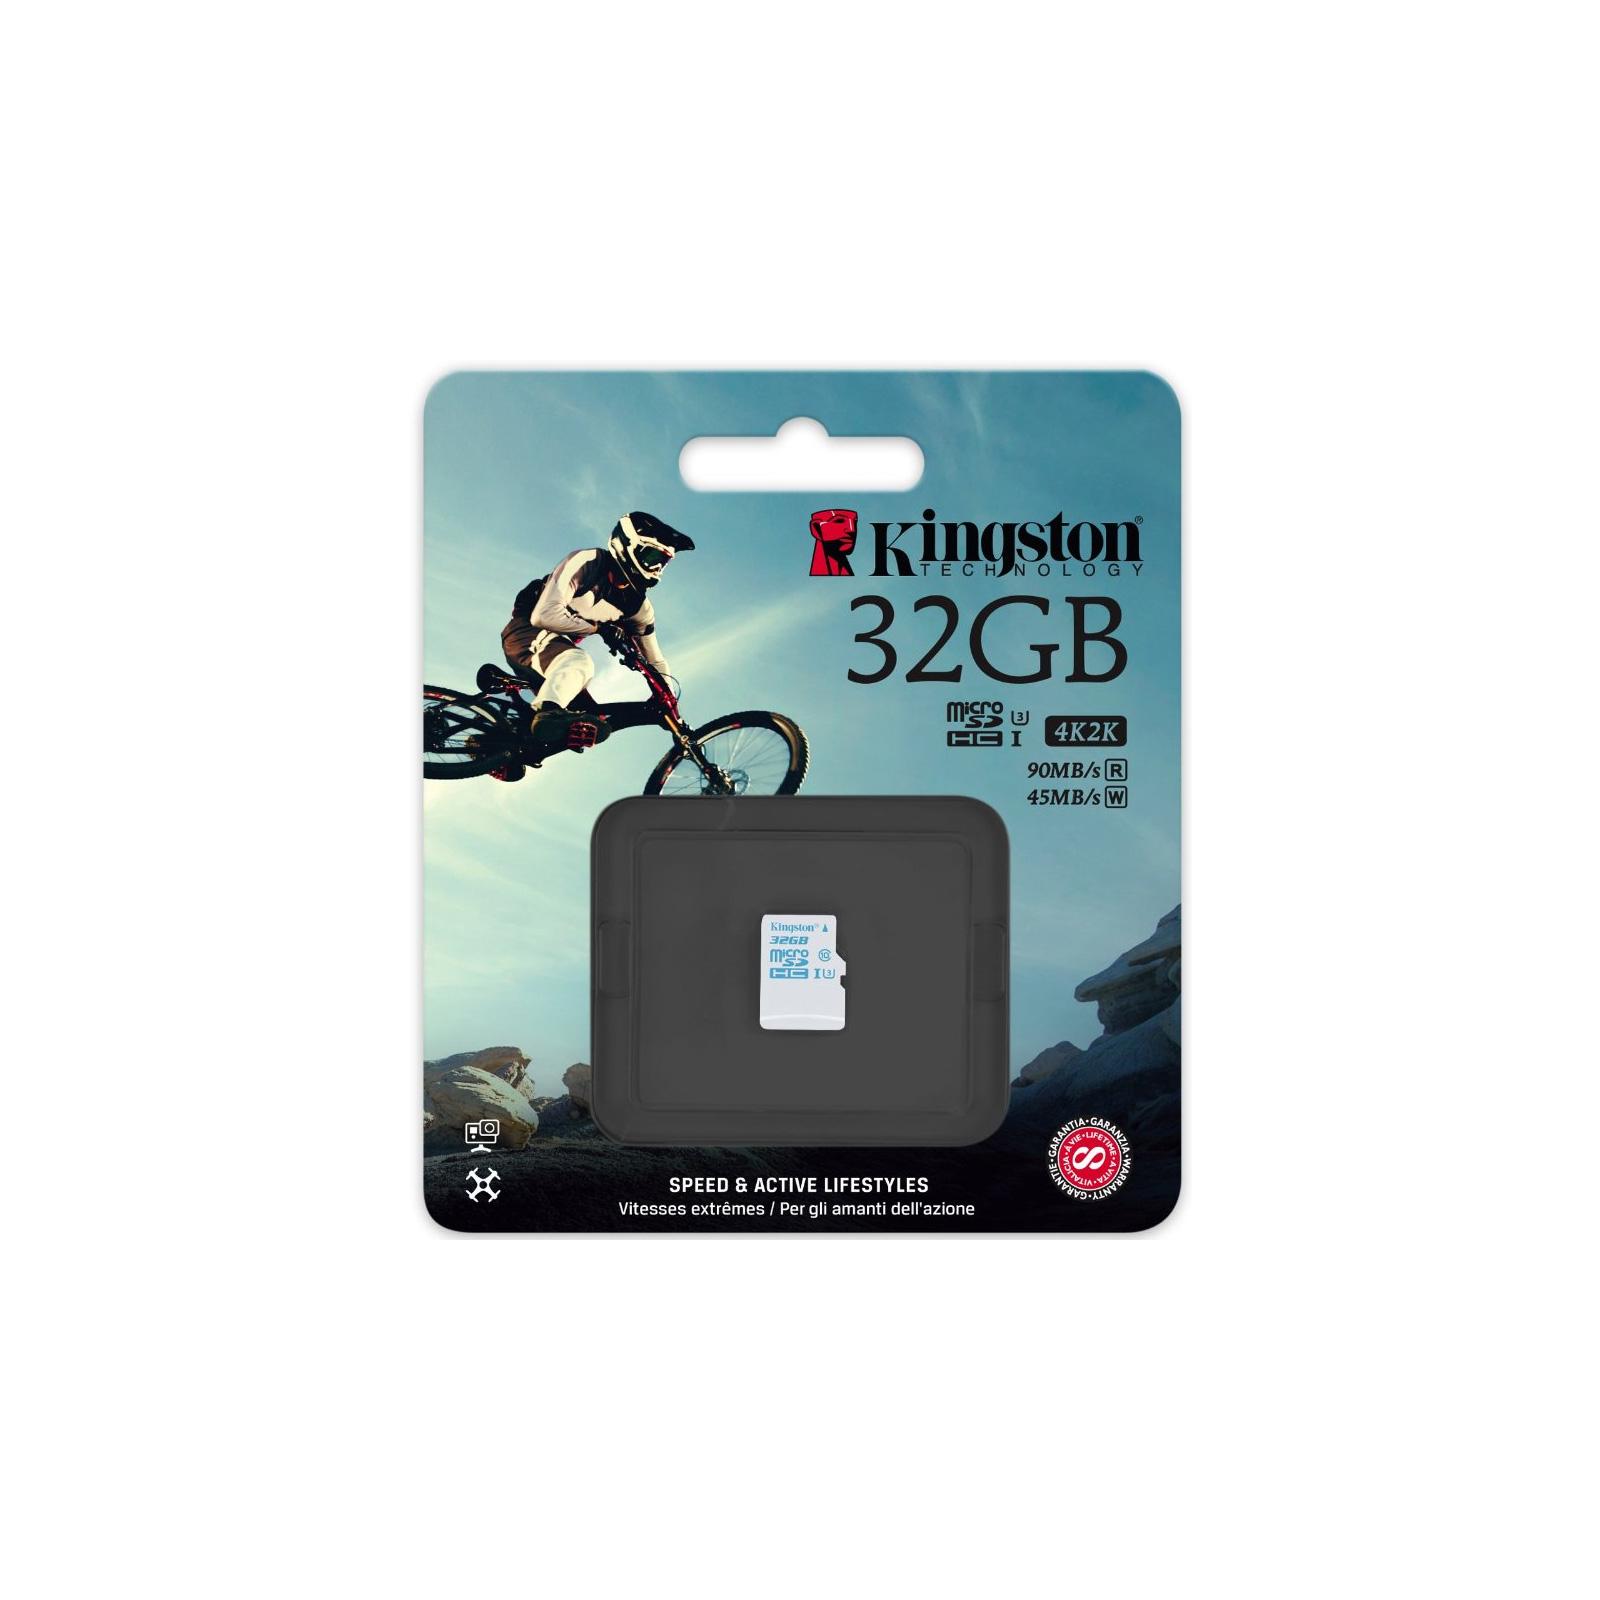 Карта памяти Kingston 32GB microSDHC class 10 UHS-I U3 (SDCAC/32GBSP) изображение 3